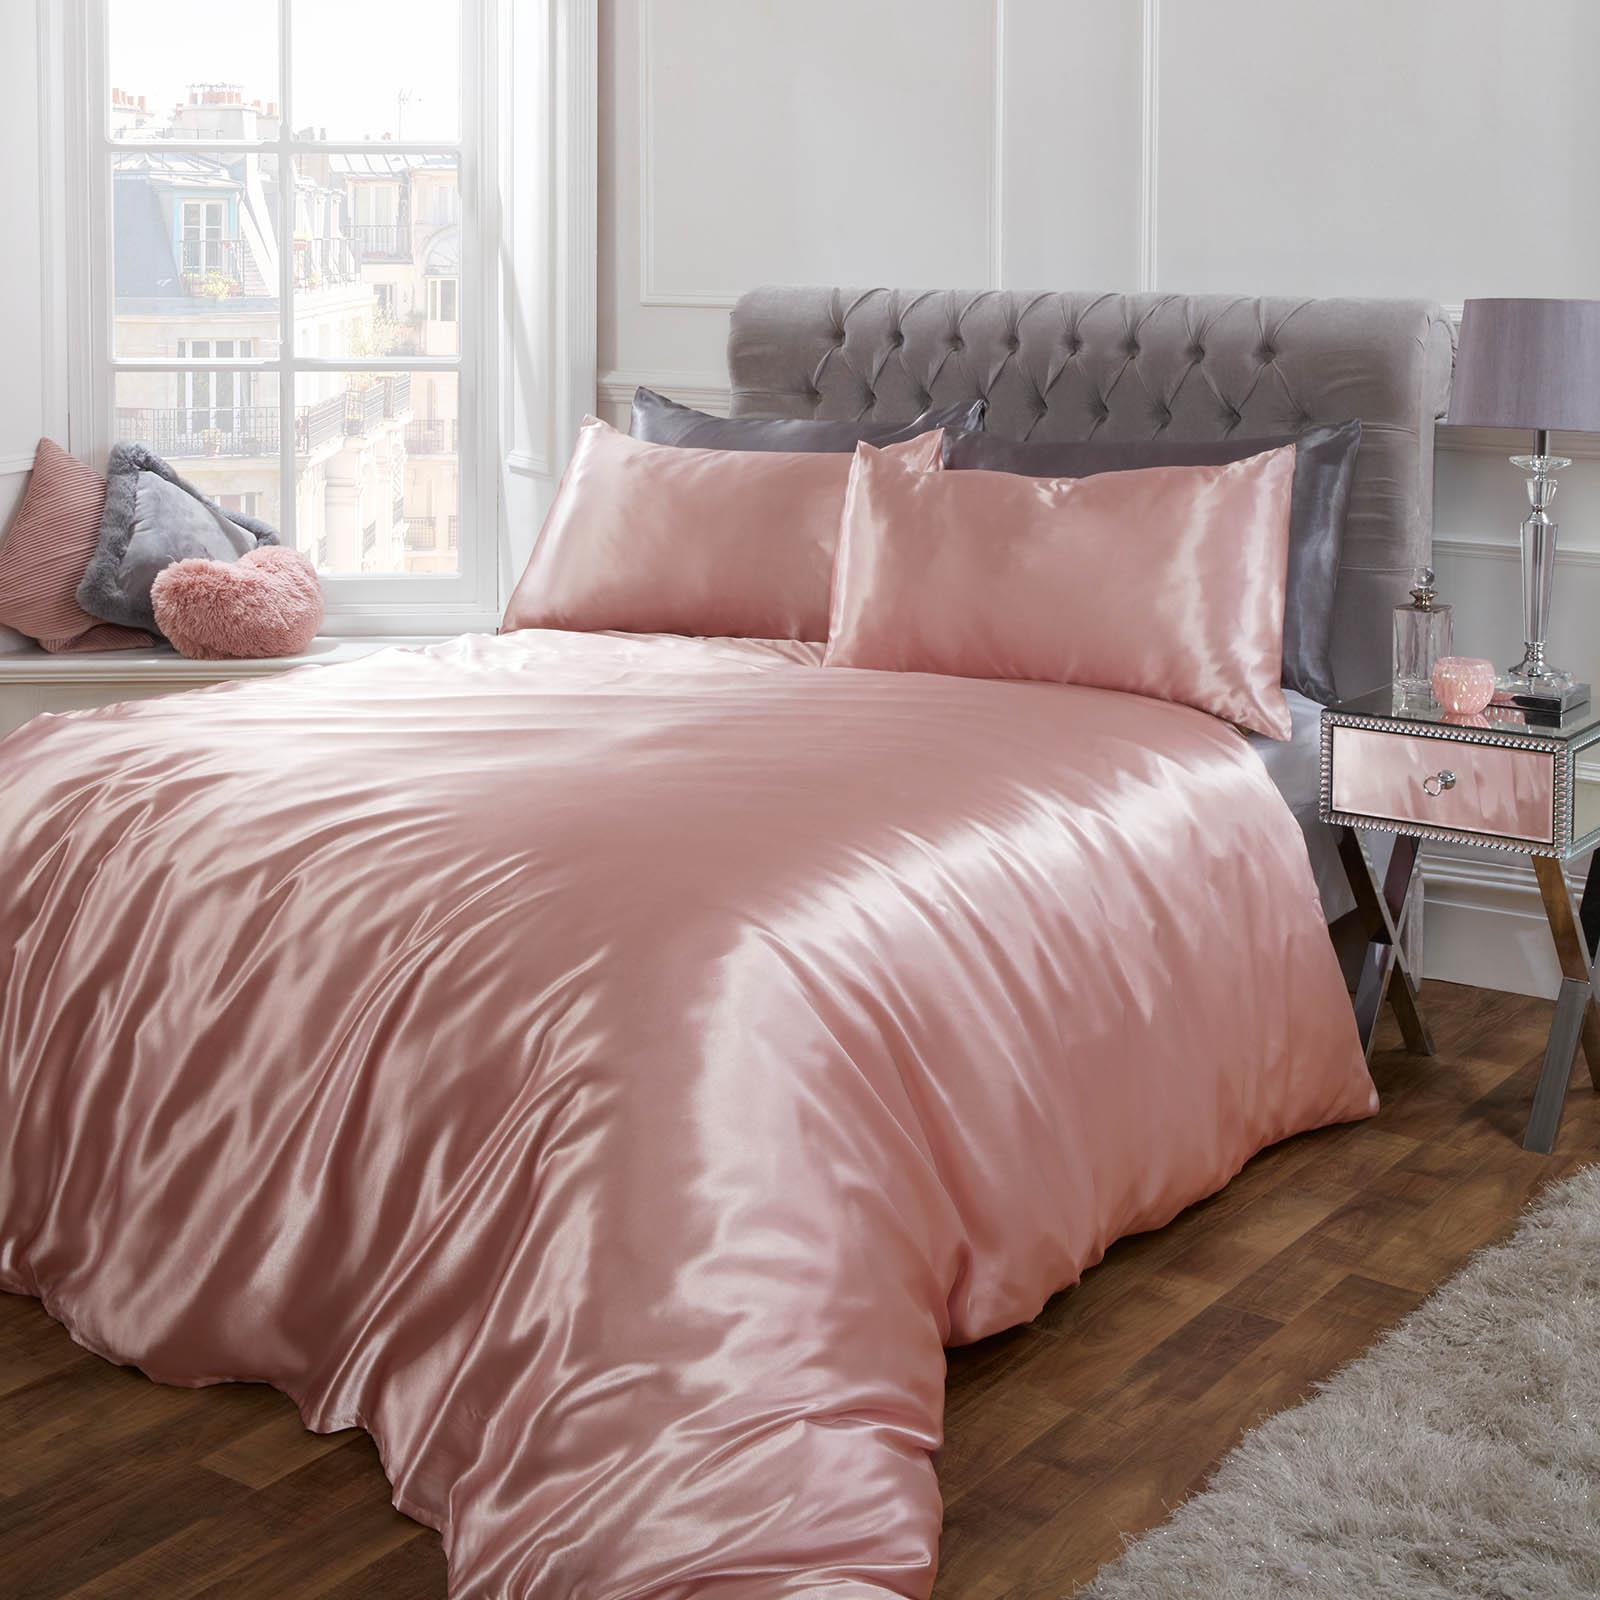 thumbnail 5 - Sienna Satin Silk Duvet Cover with Pillowcases Bedding Set, Blush Pink Silver